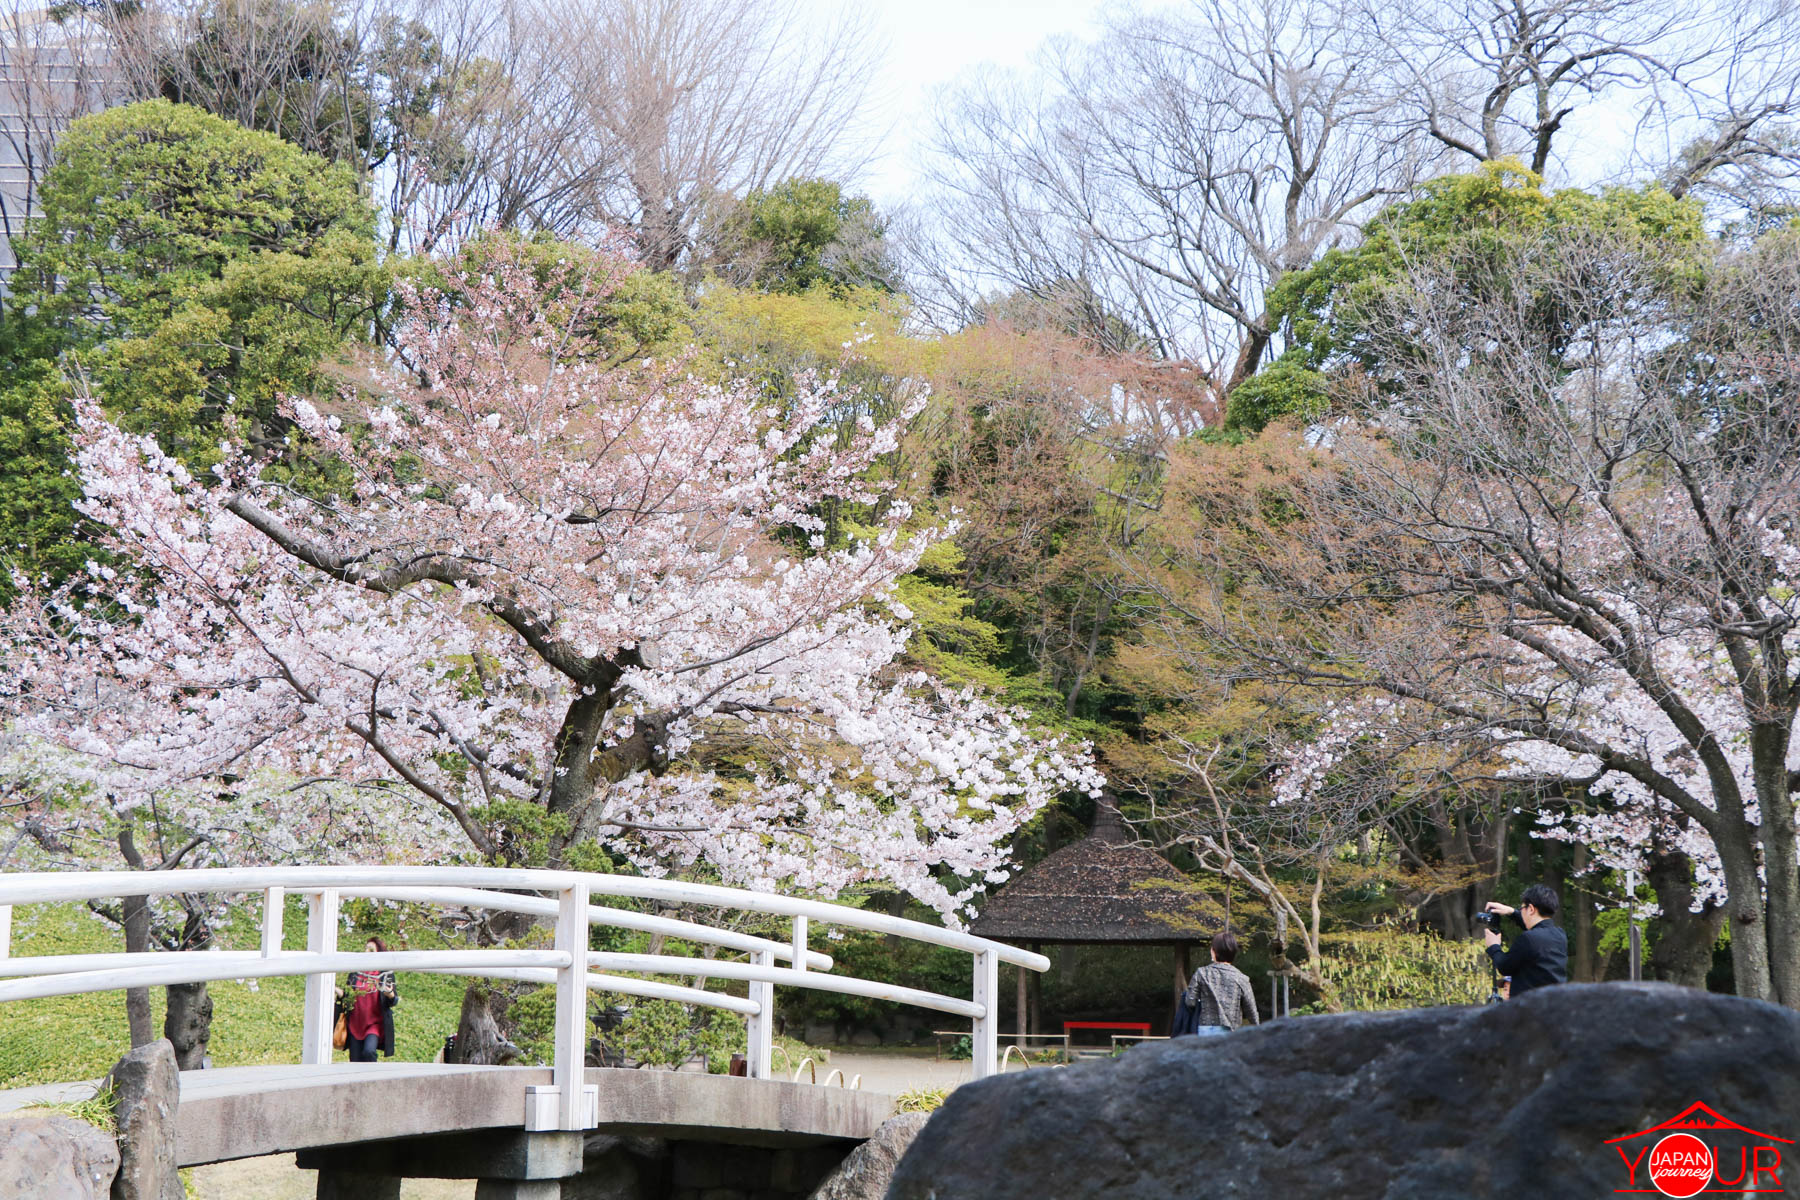 Japan Cherry Blossom Forecast 2021 - Koishikawa Korakuen Park